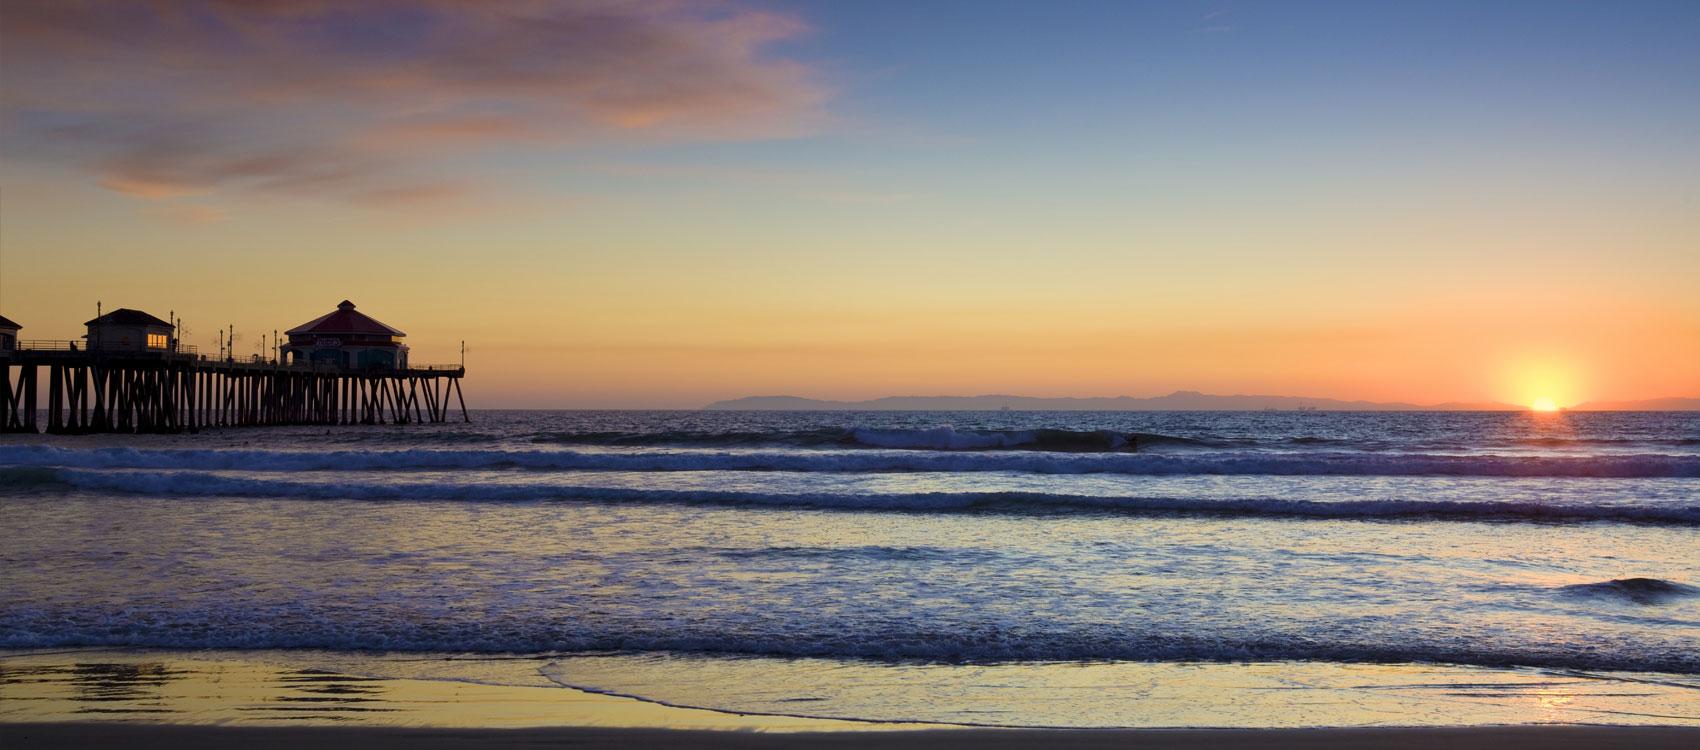 oceanfront huntington beach hotels kimpton shorebreak hotel. Black Bedroom Furniture Sets. Home Design Ideas